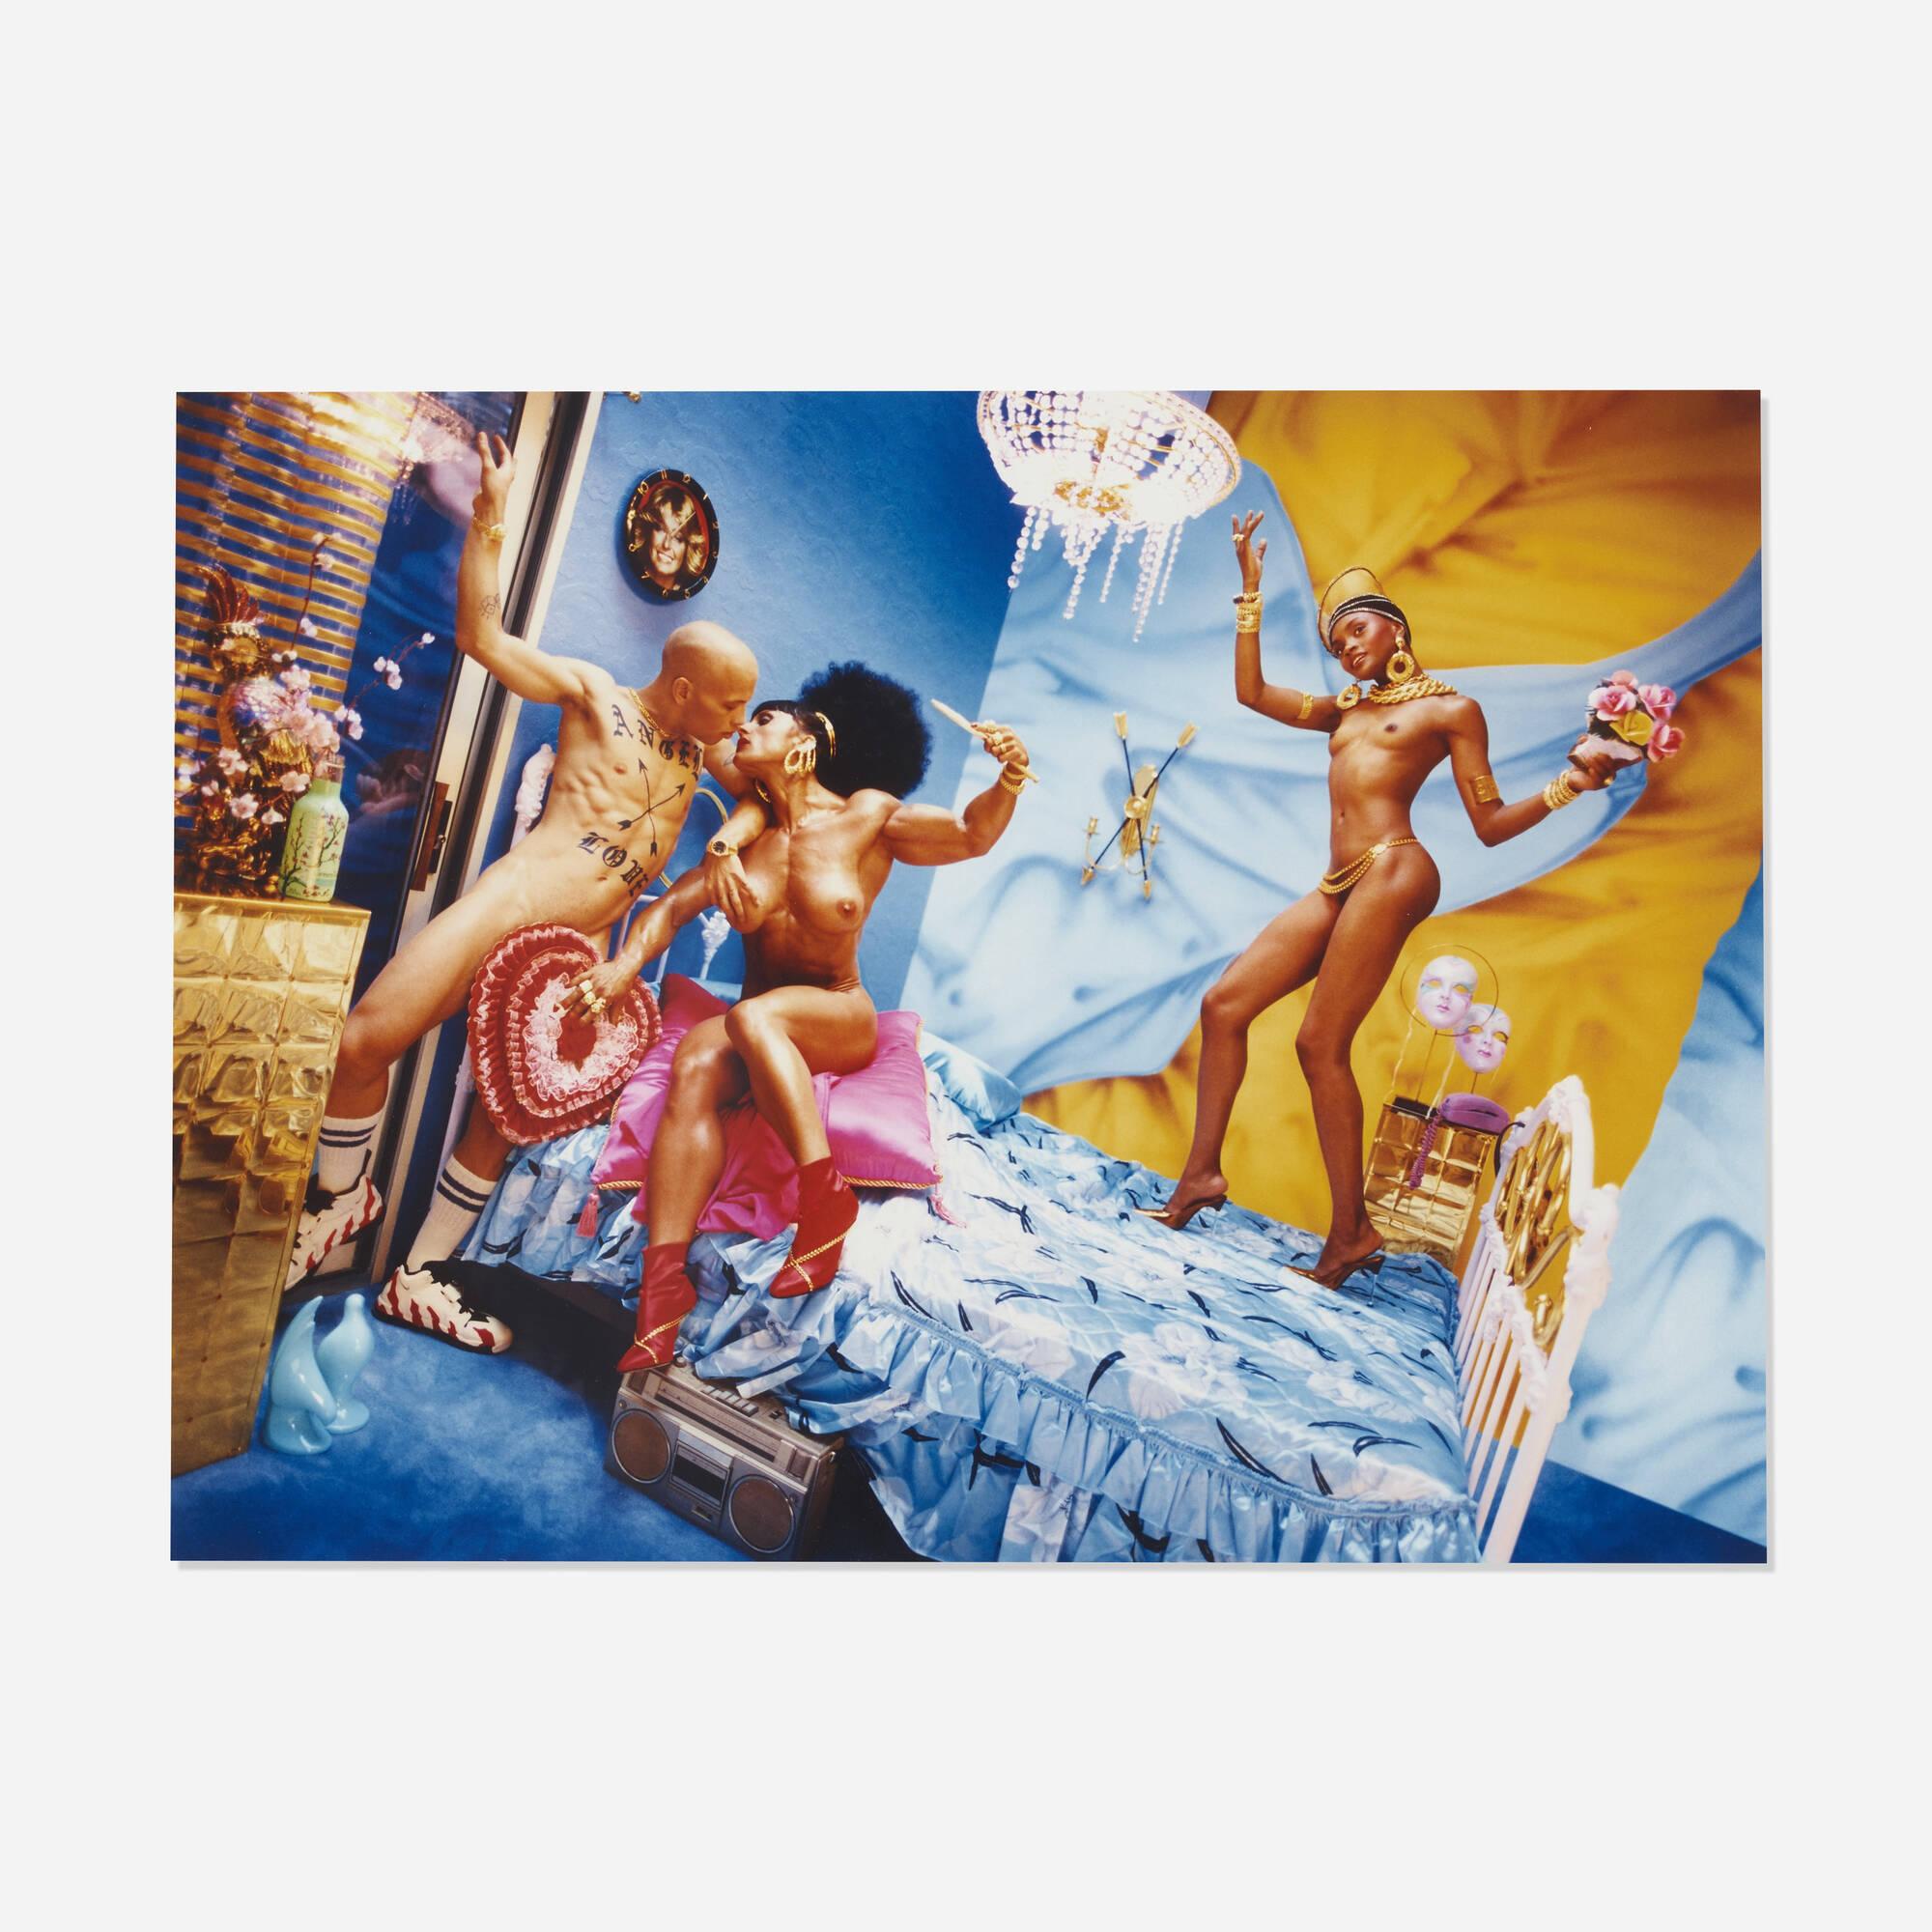 159: David LaChapelle / Untitled (1 of 1)